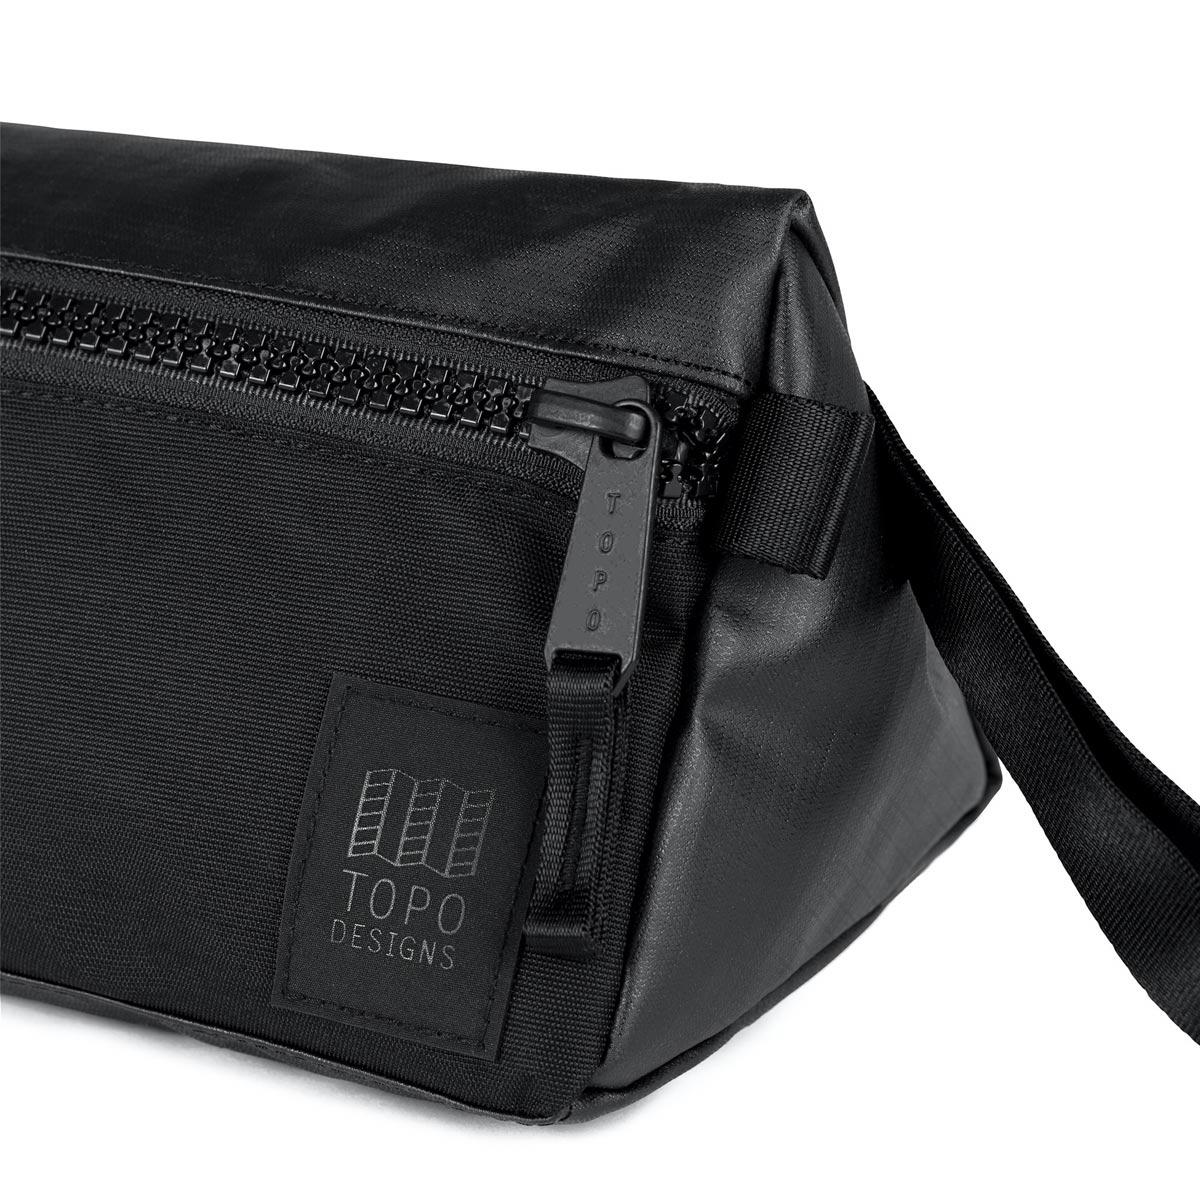 Topo Designs Dopp Kit Premium Black, water-resistant, travel light, accessory bag